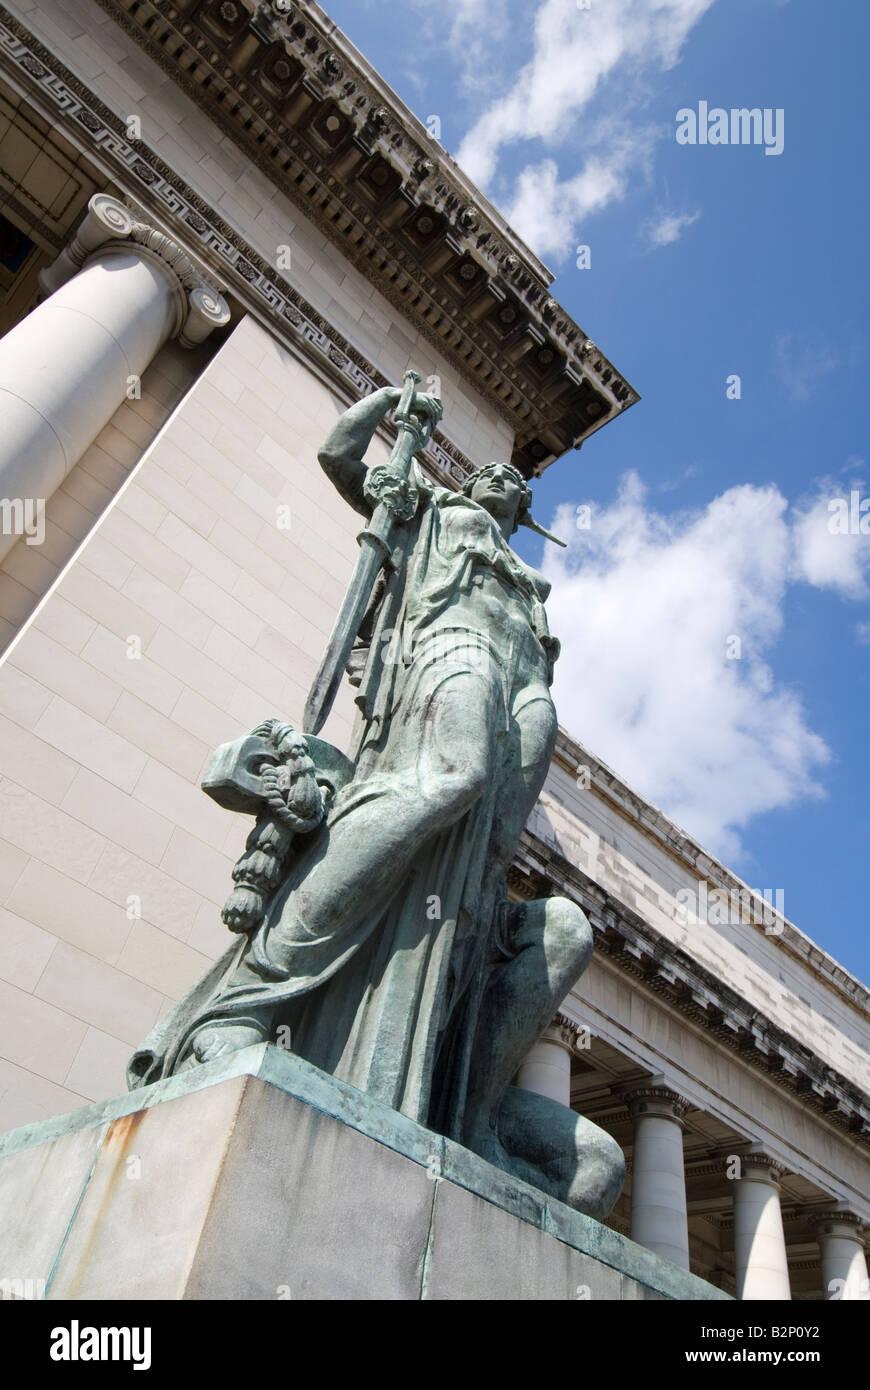 Statue in front of the Capitolio in La Habana Vieja Havana Cuba - Stock Image